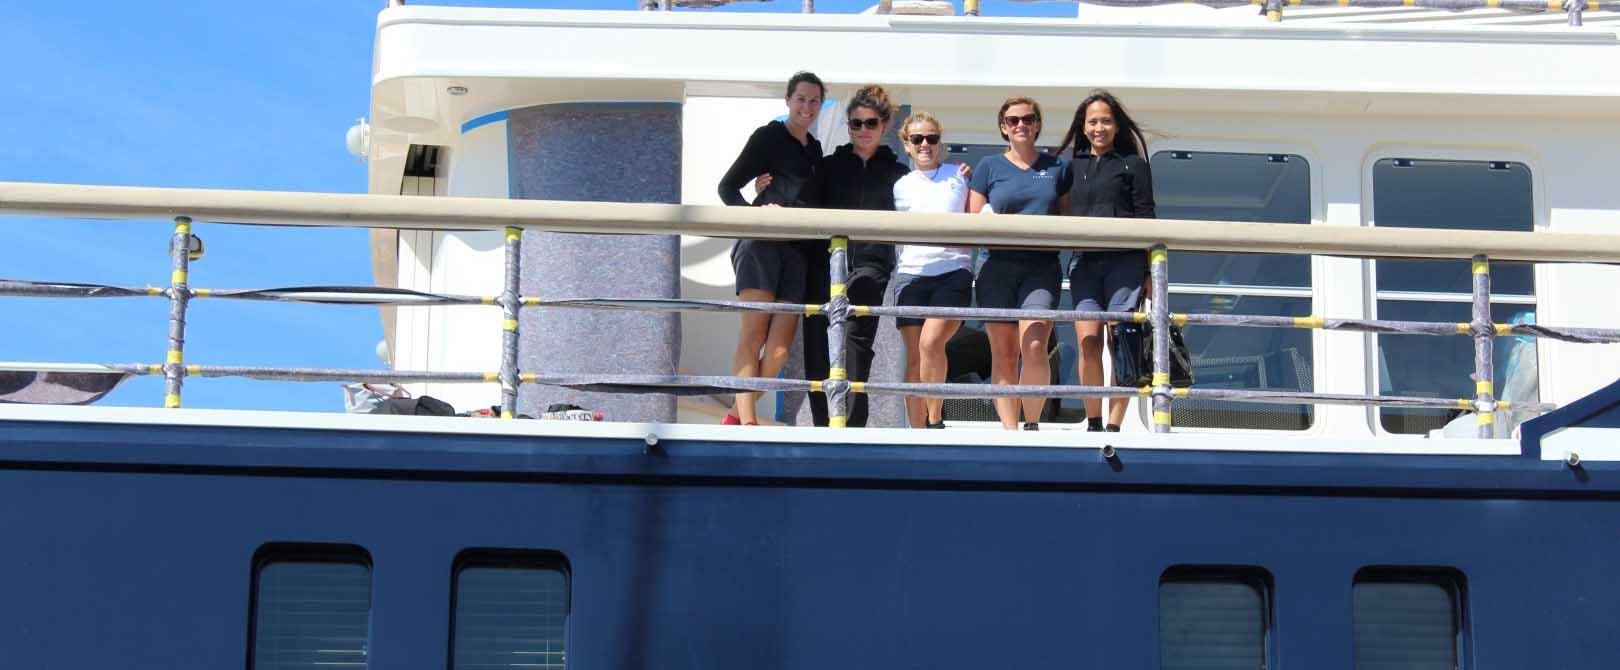 Atollvic Yacht Crew Care